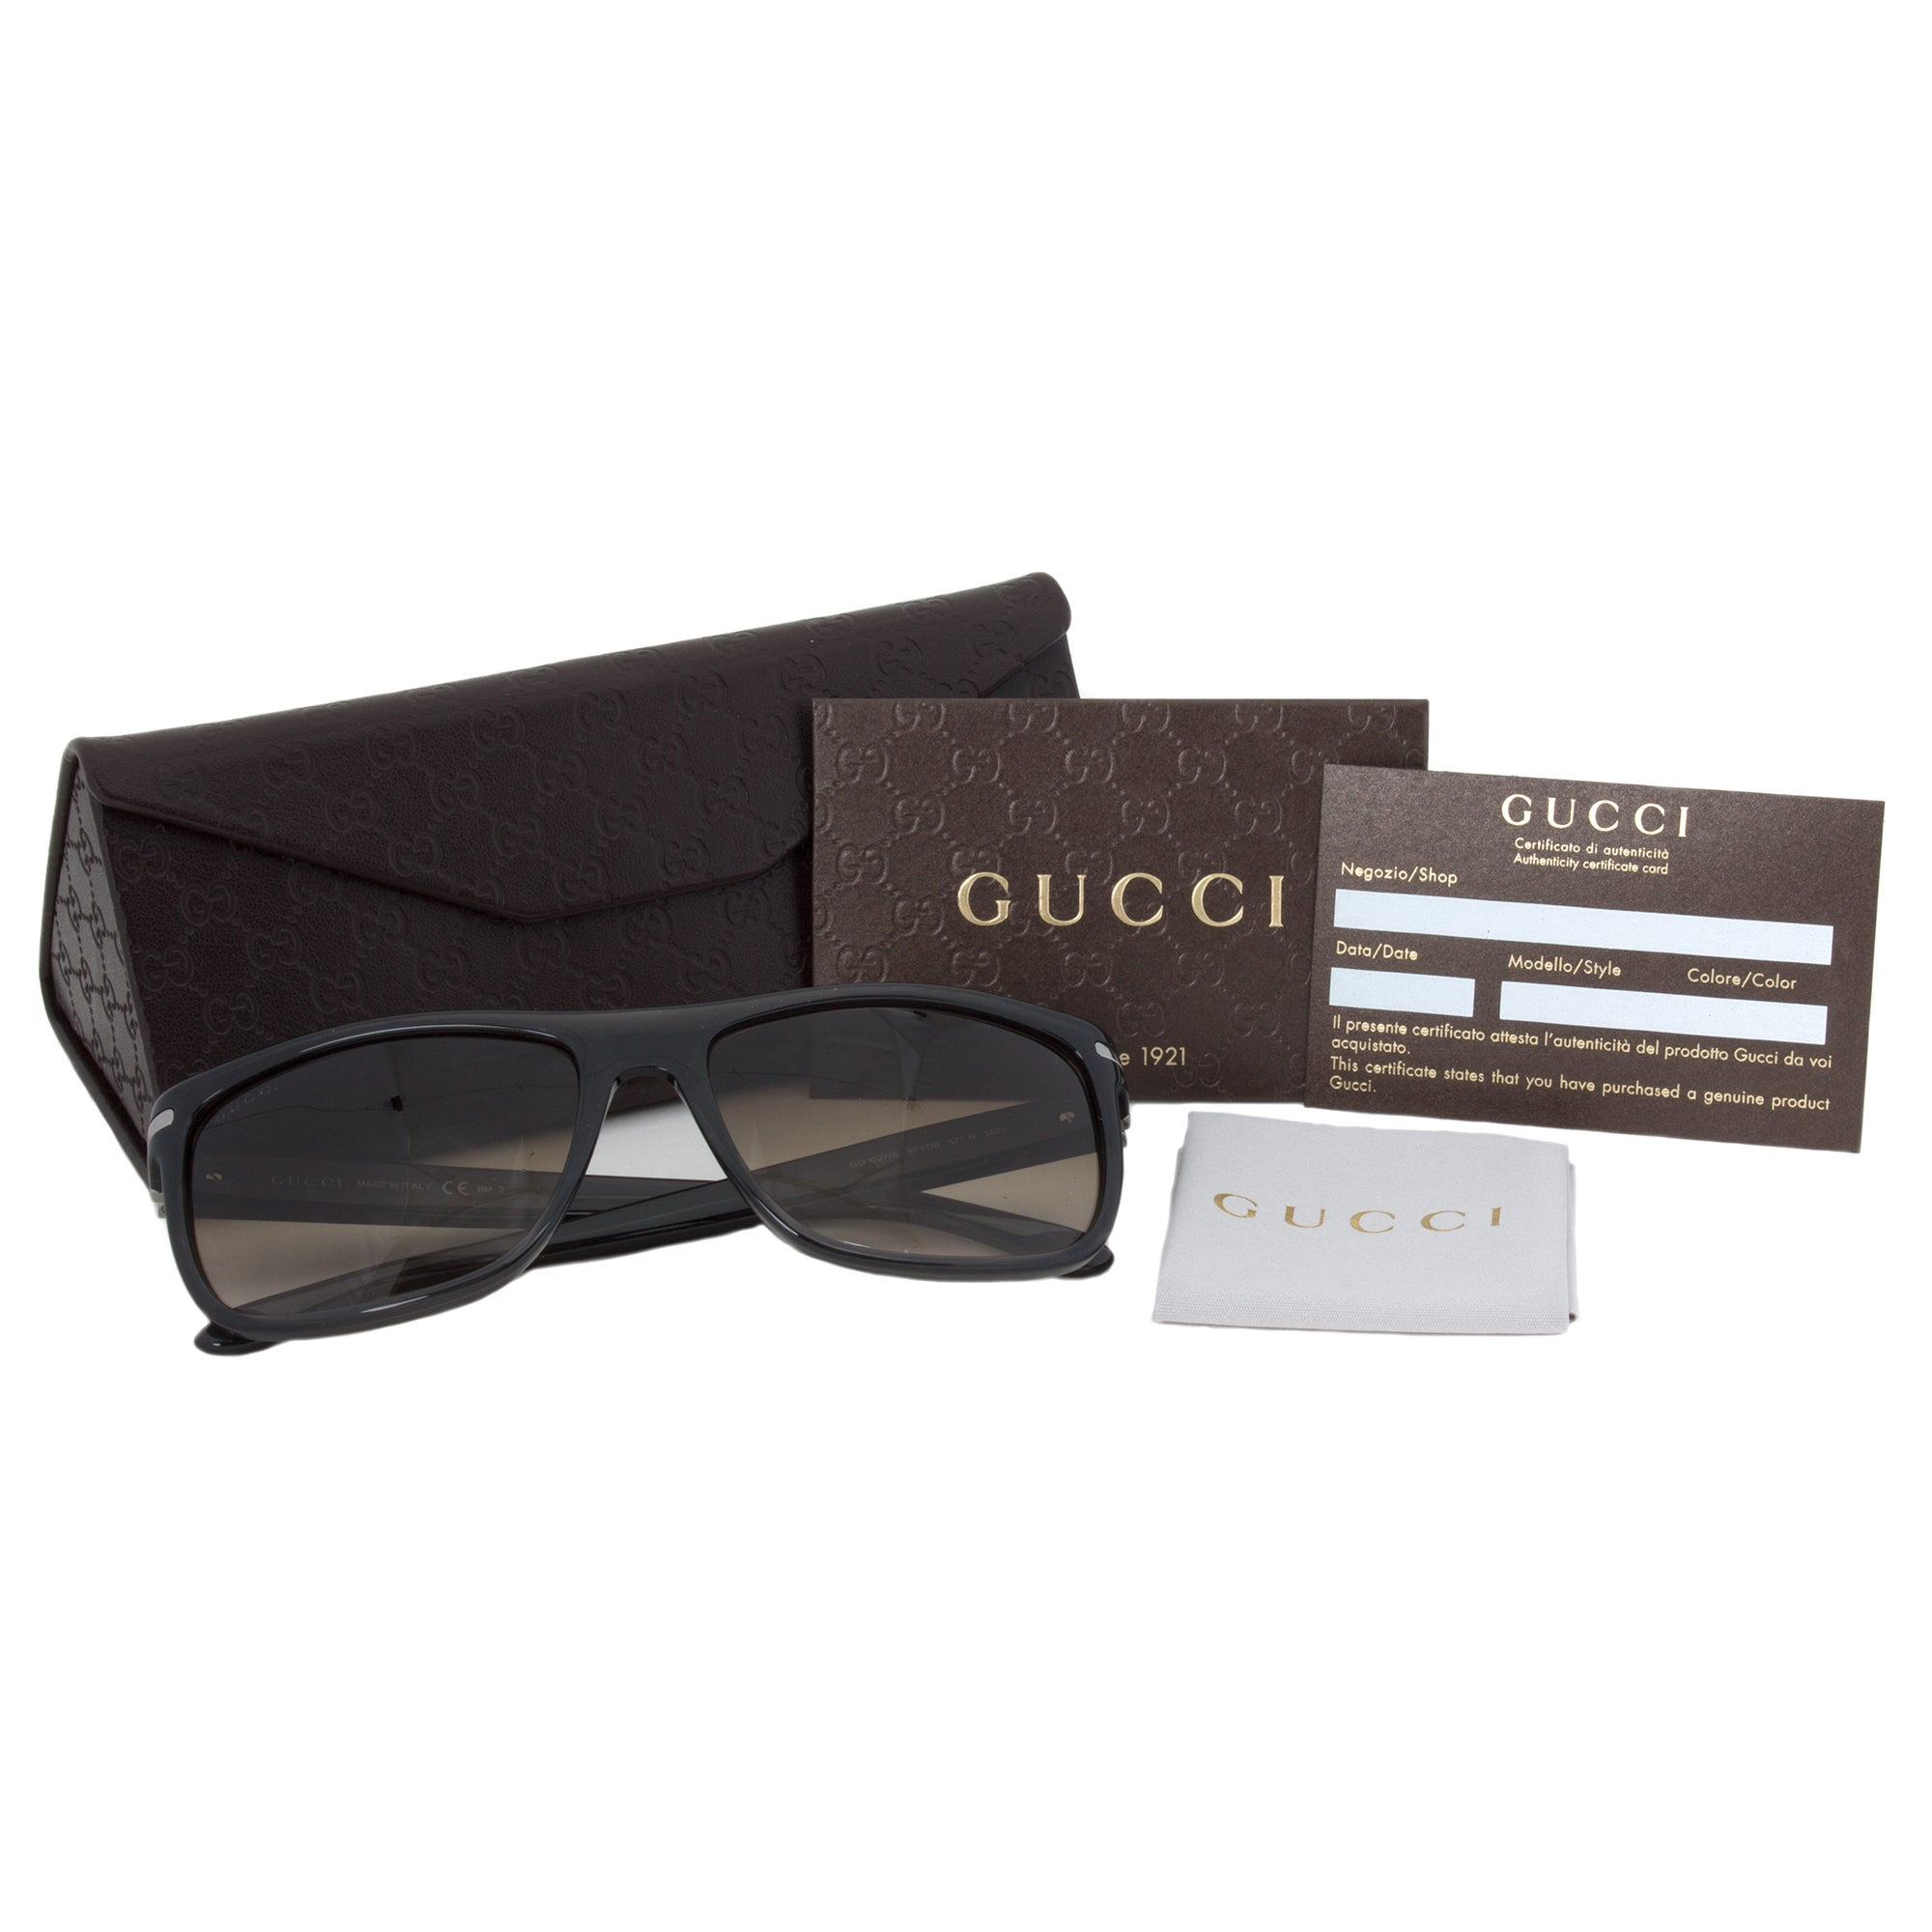 dd9d5b16ea Shop Gucci Men s 1027 S Plastic Rectangular Sunglasses - Grey - Free  Shipping Today - Overstock - 10019063